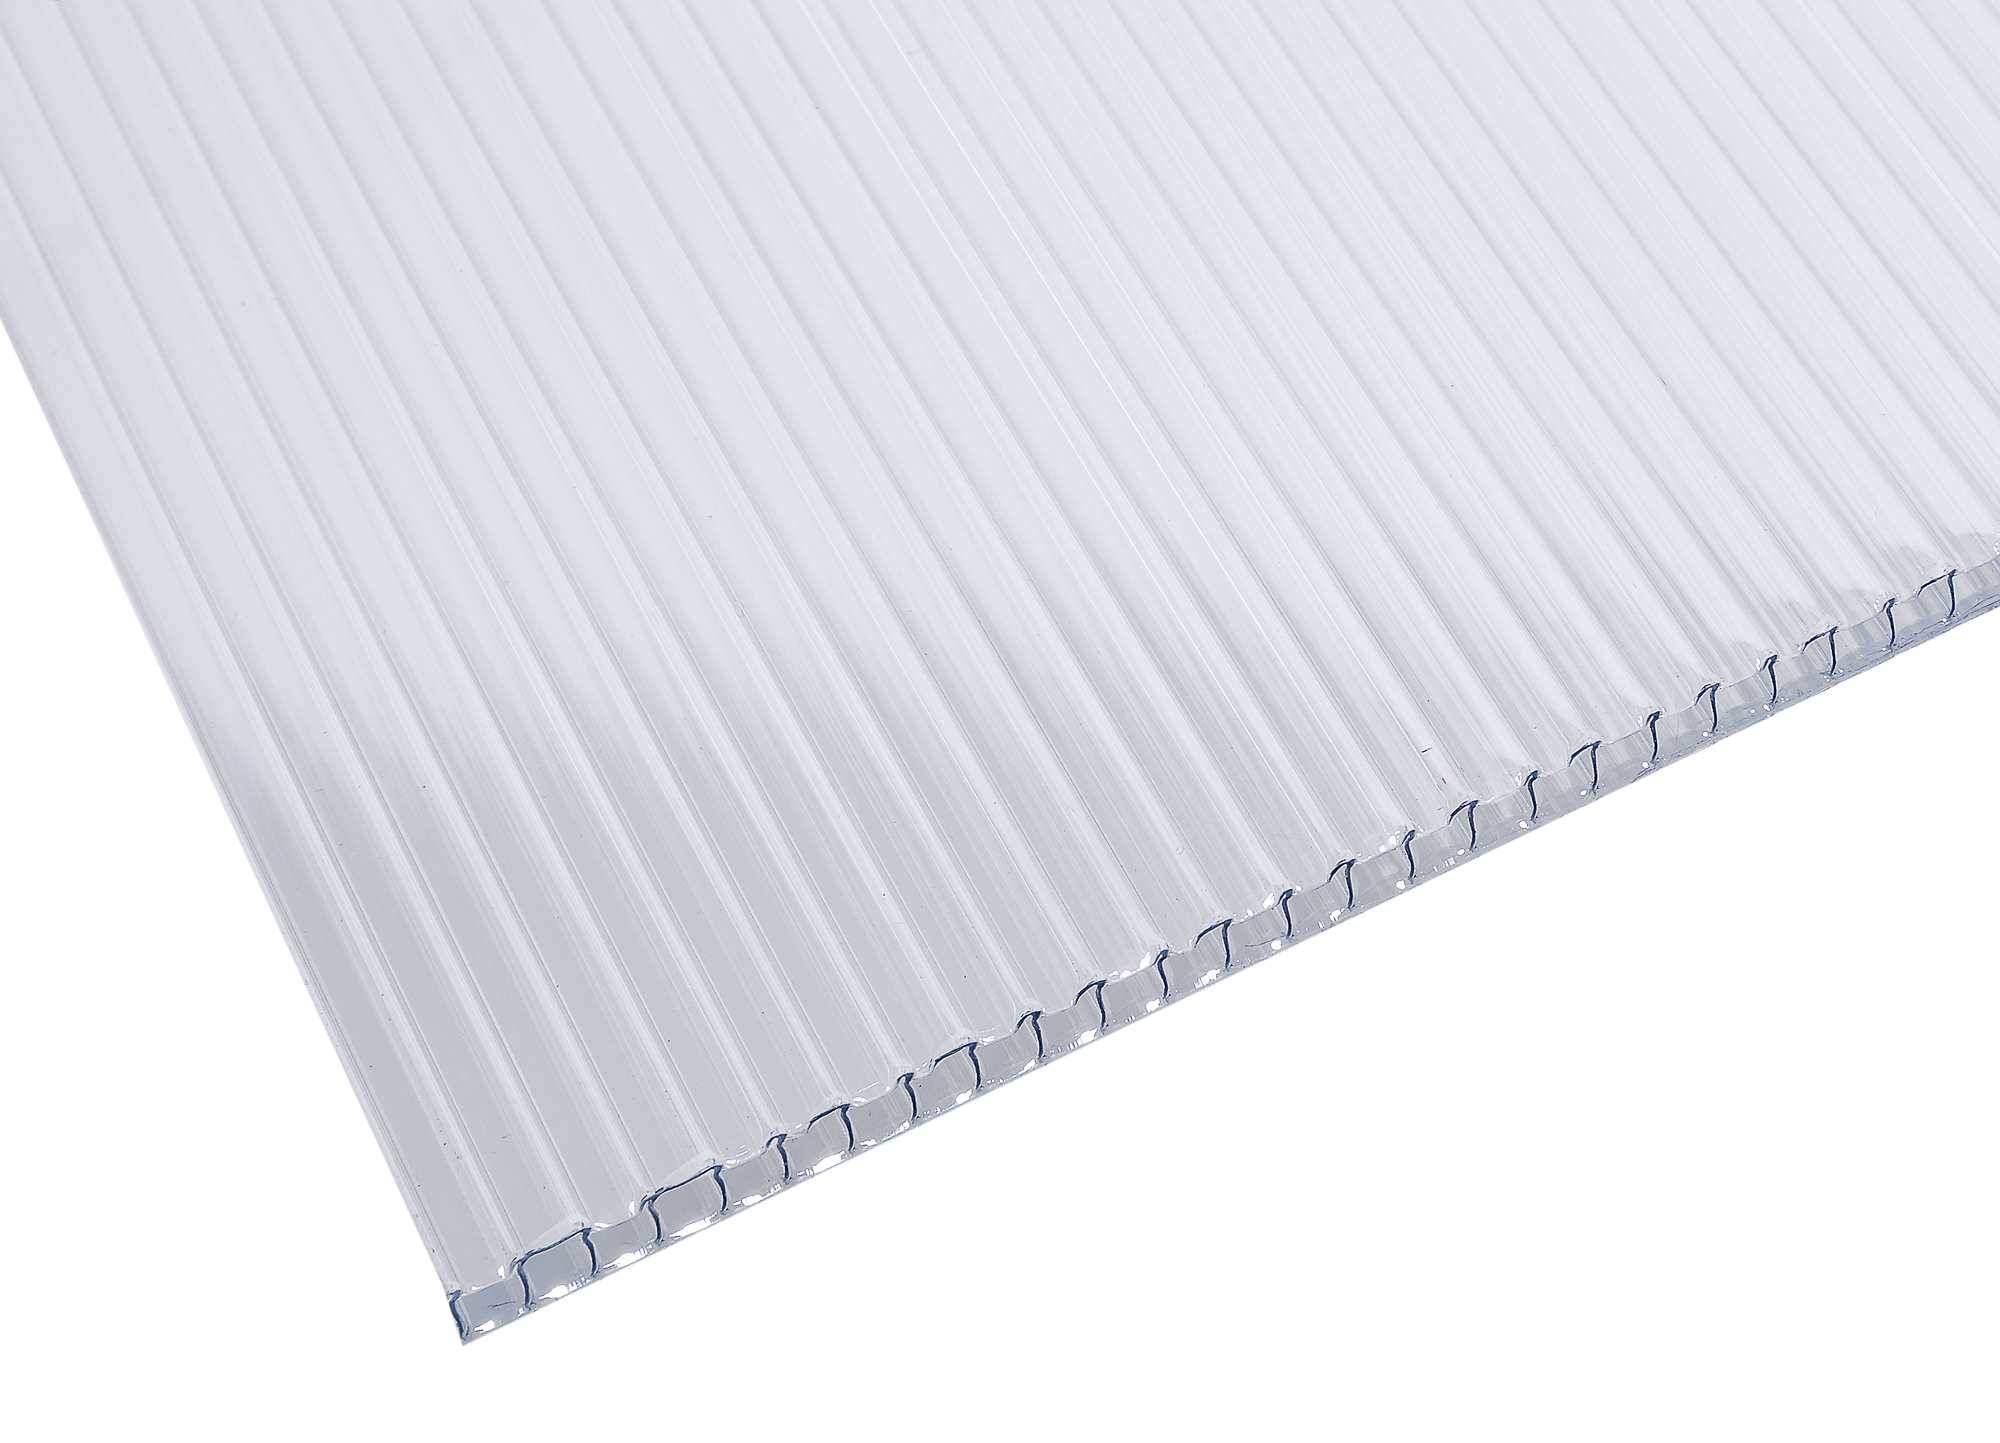 plaque pvc leroy merlin plaque polycarbonate 10mm. Black Bedroom Furniture Sets. Home Design Ideas